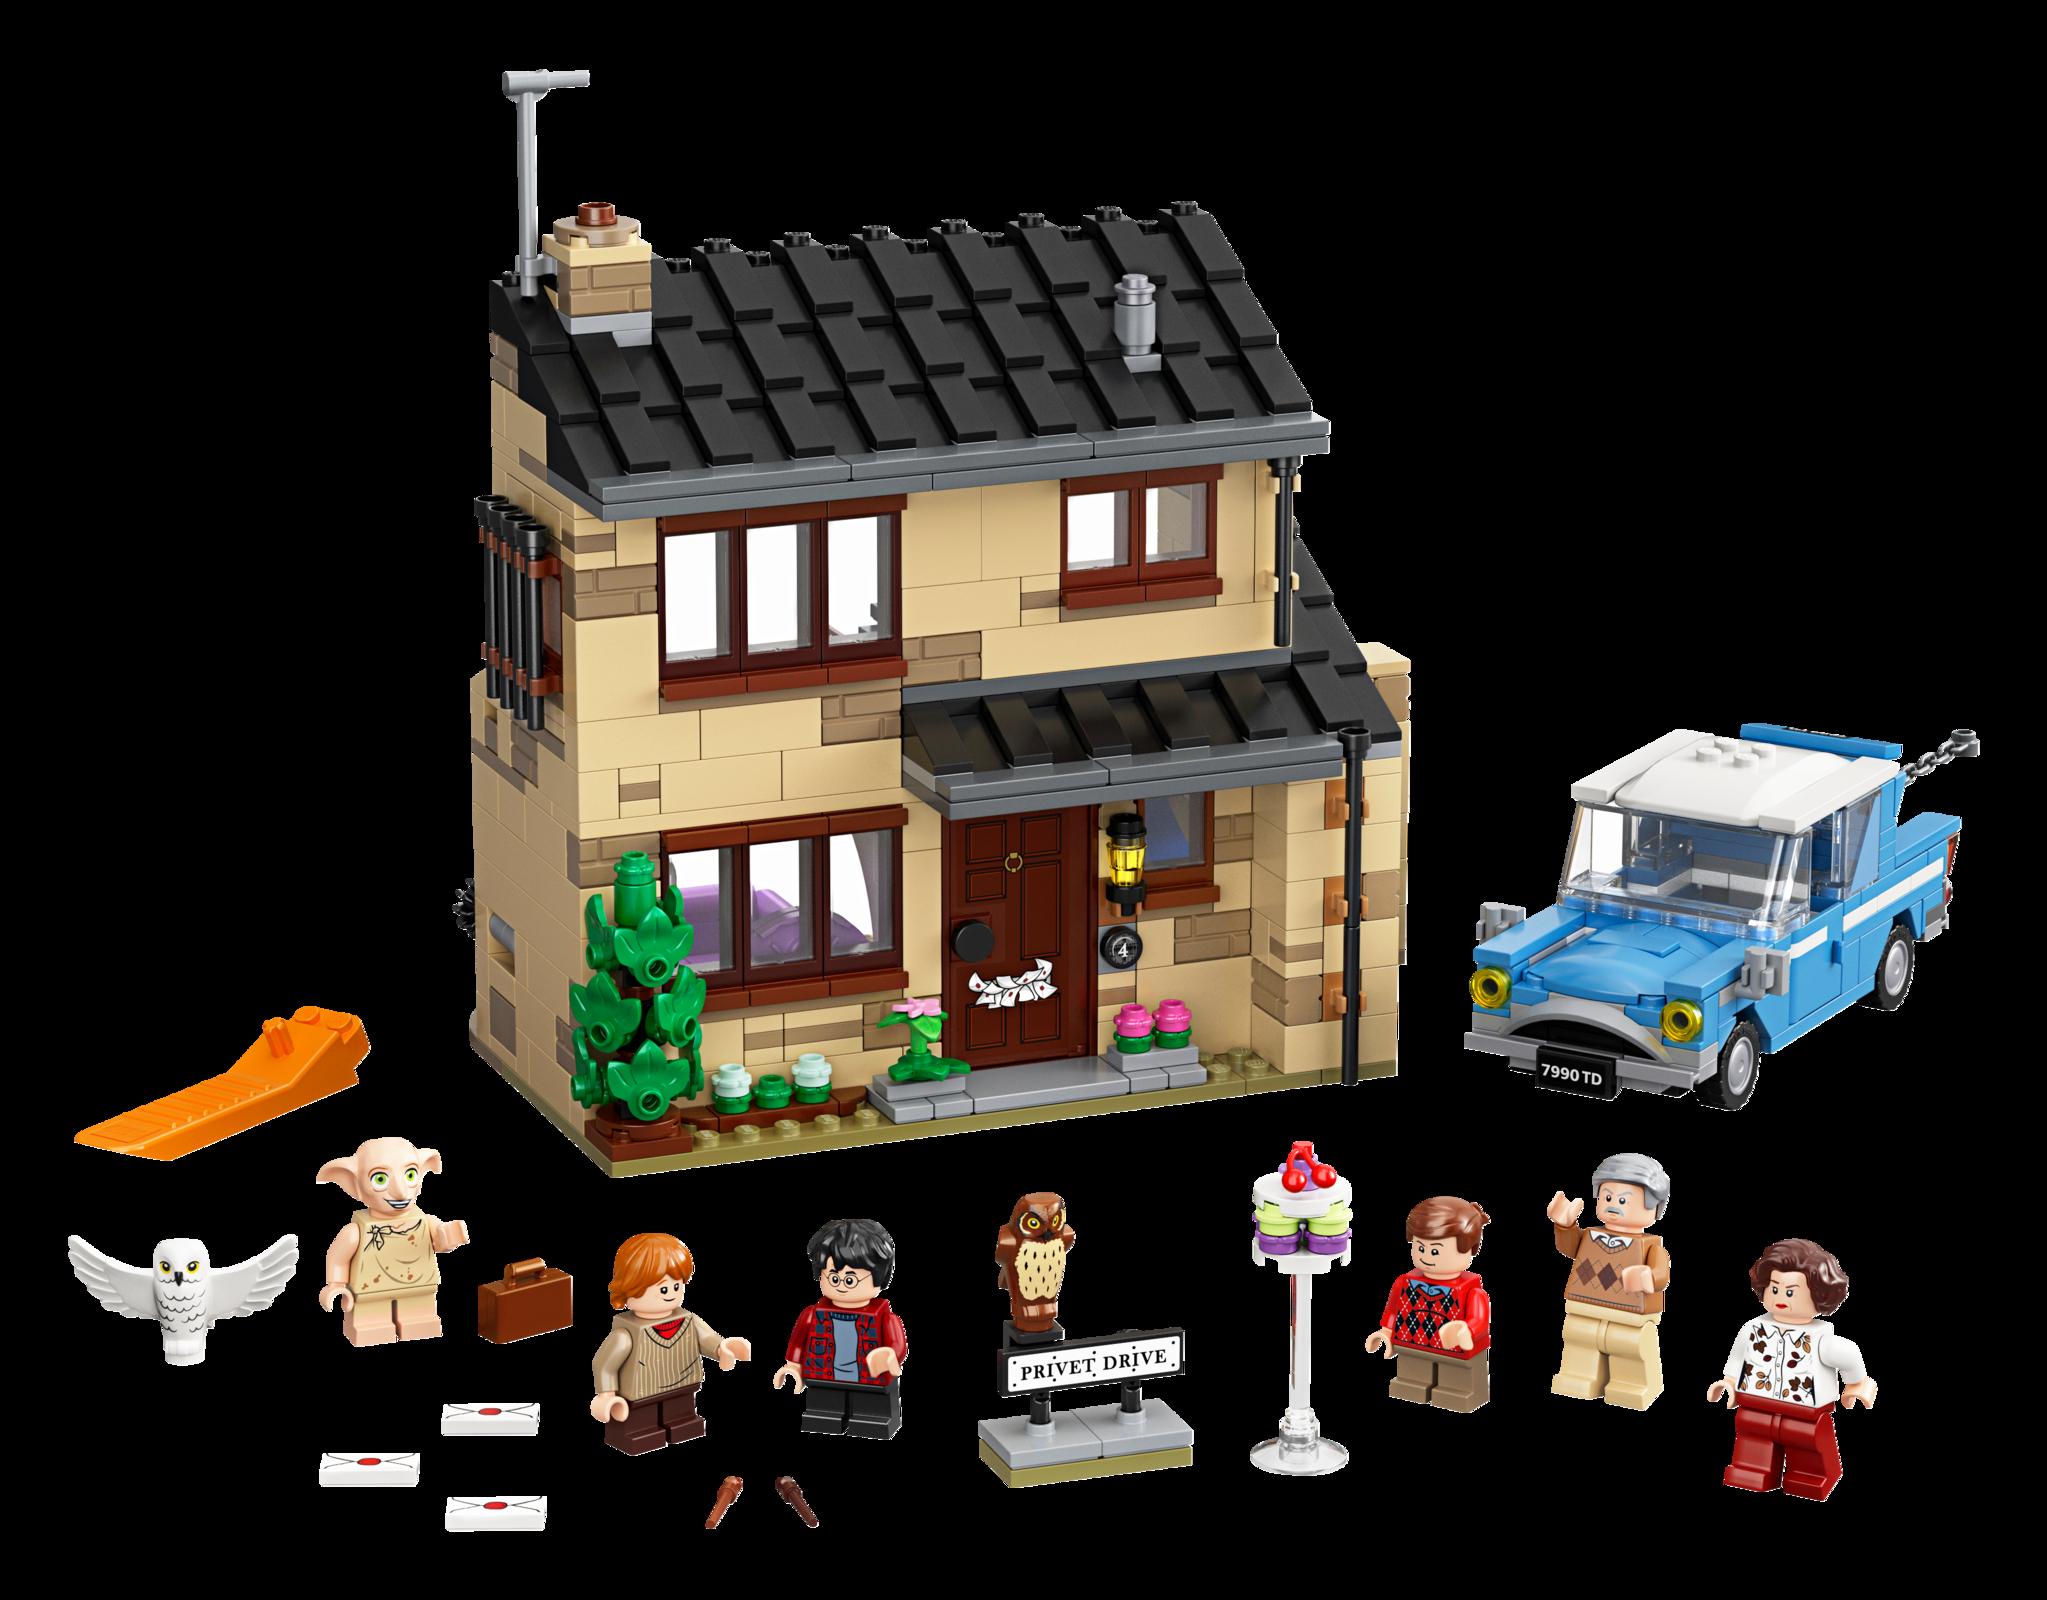 Lego LEGO HARRY POTTER: 4 Privet Drive